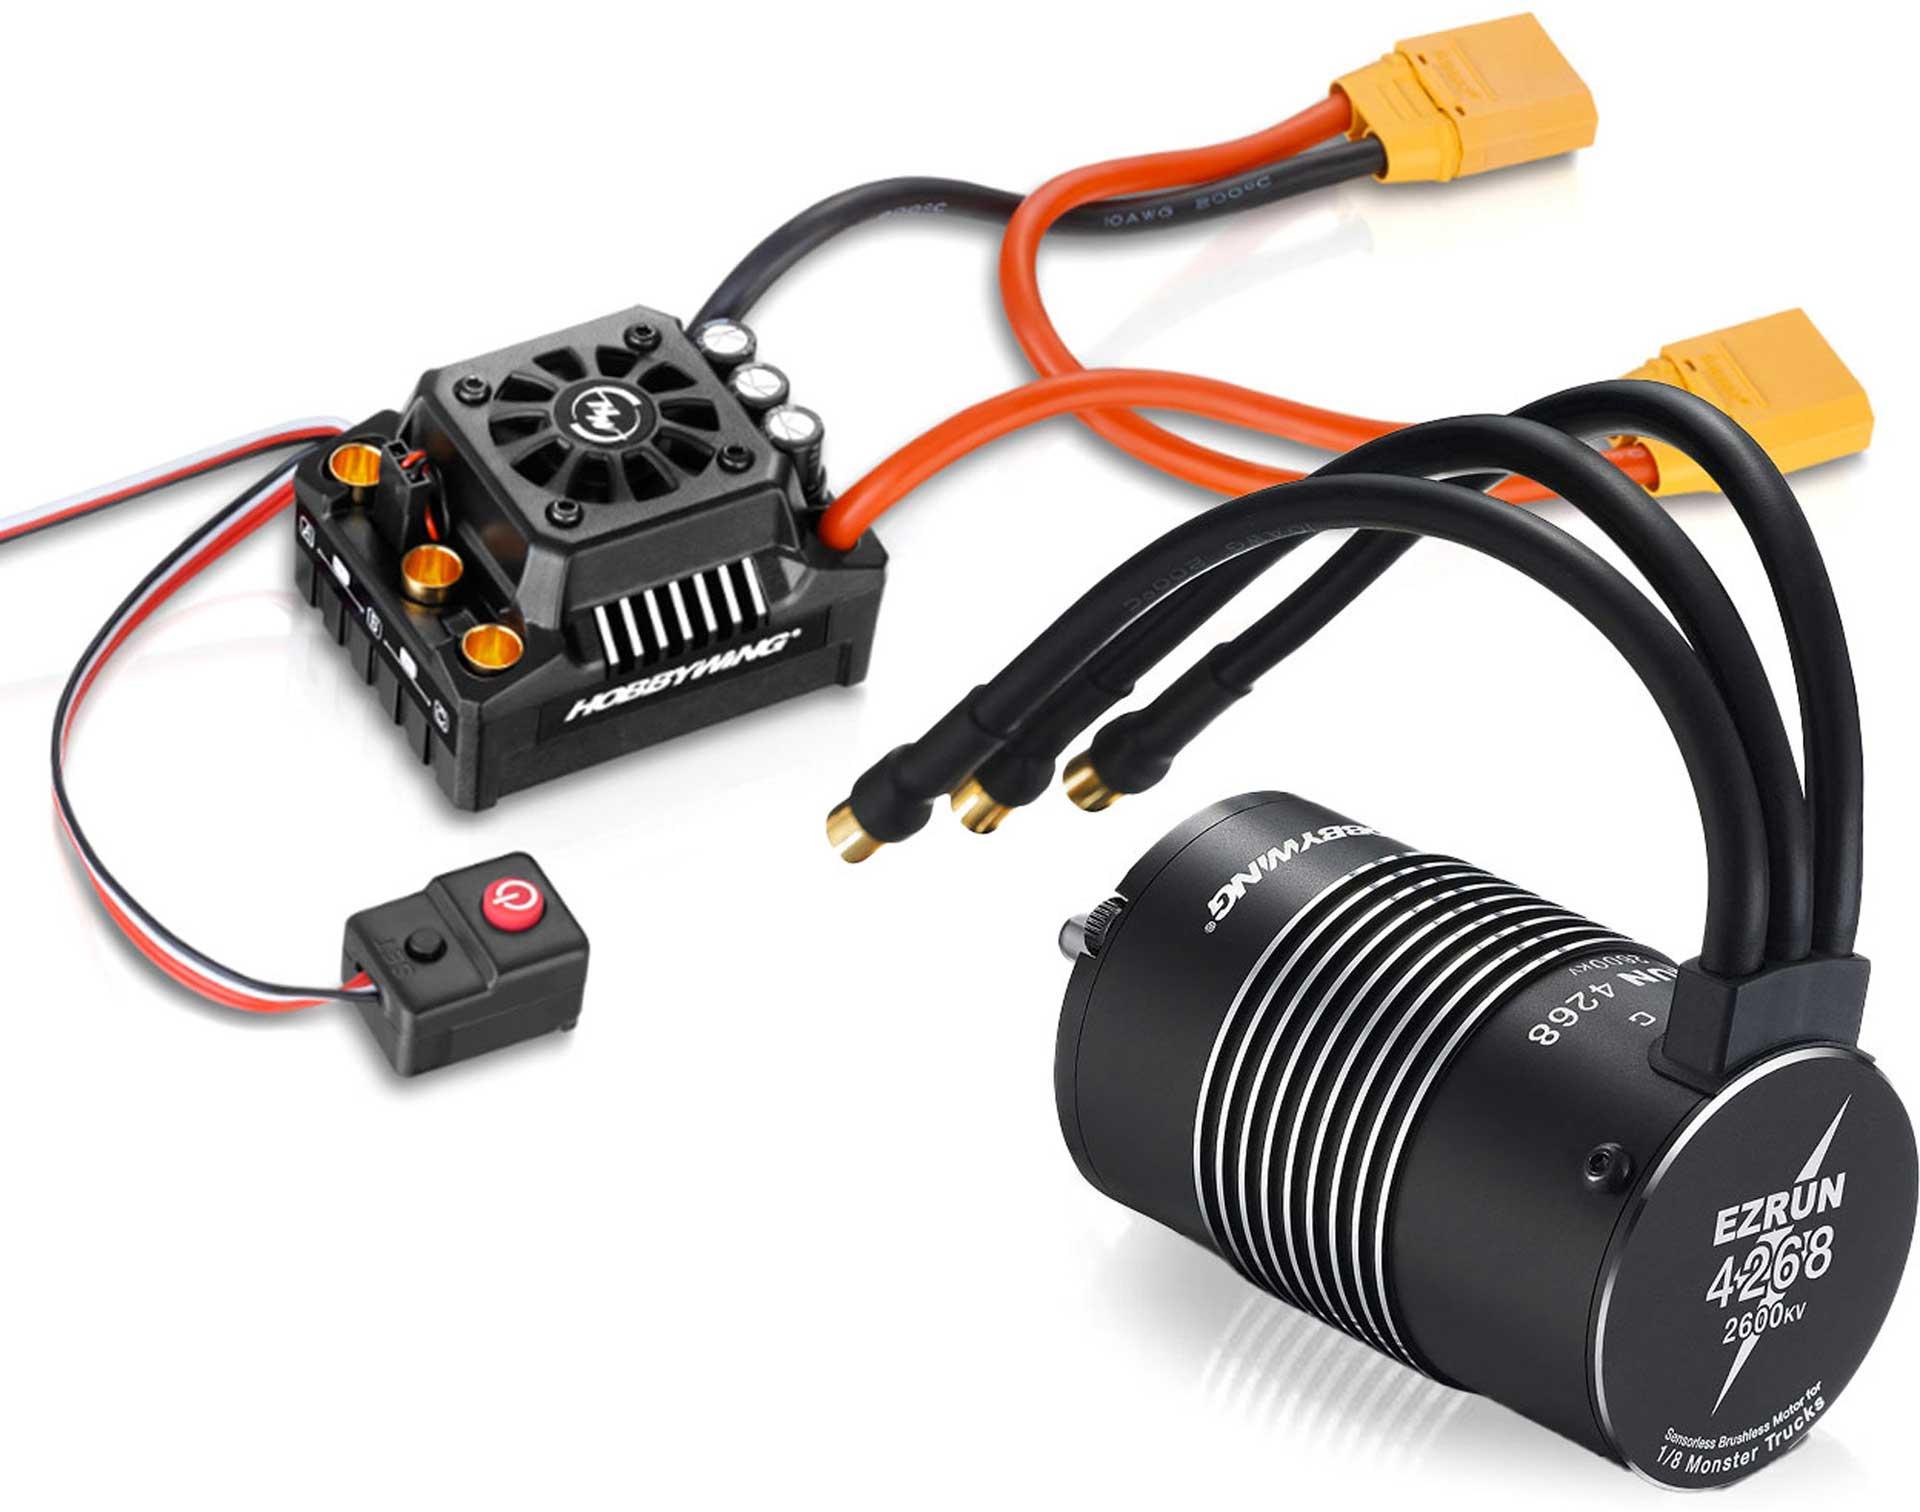 HOBBYWING Ezrun MAX8 Combo mit SL-4268-2600kV Sensorless 1/8